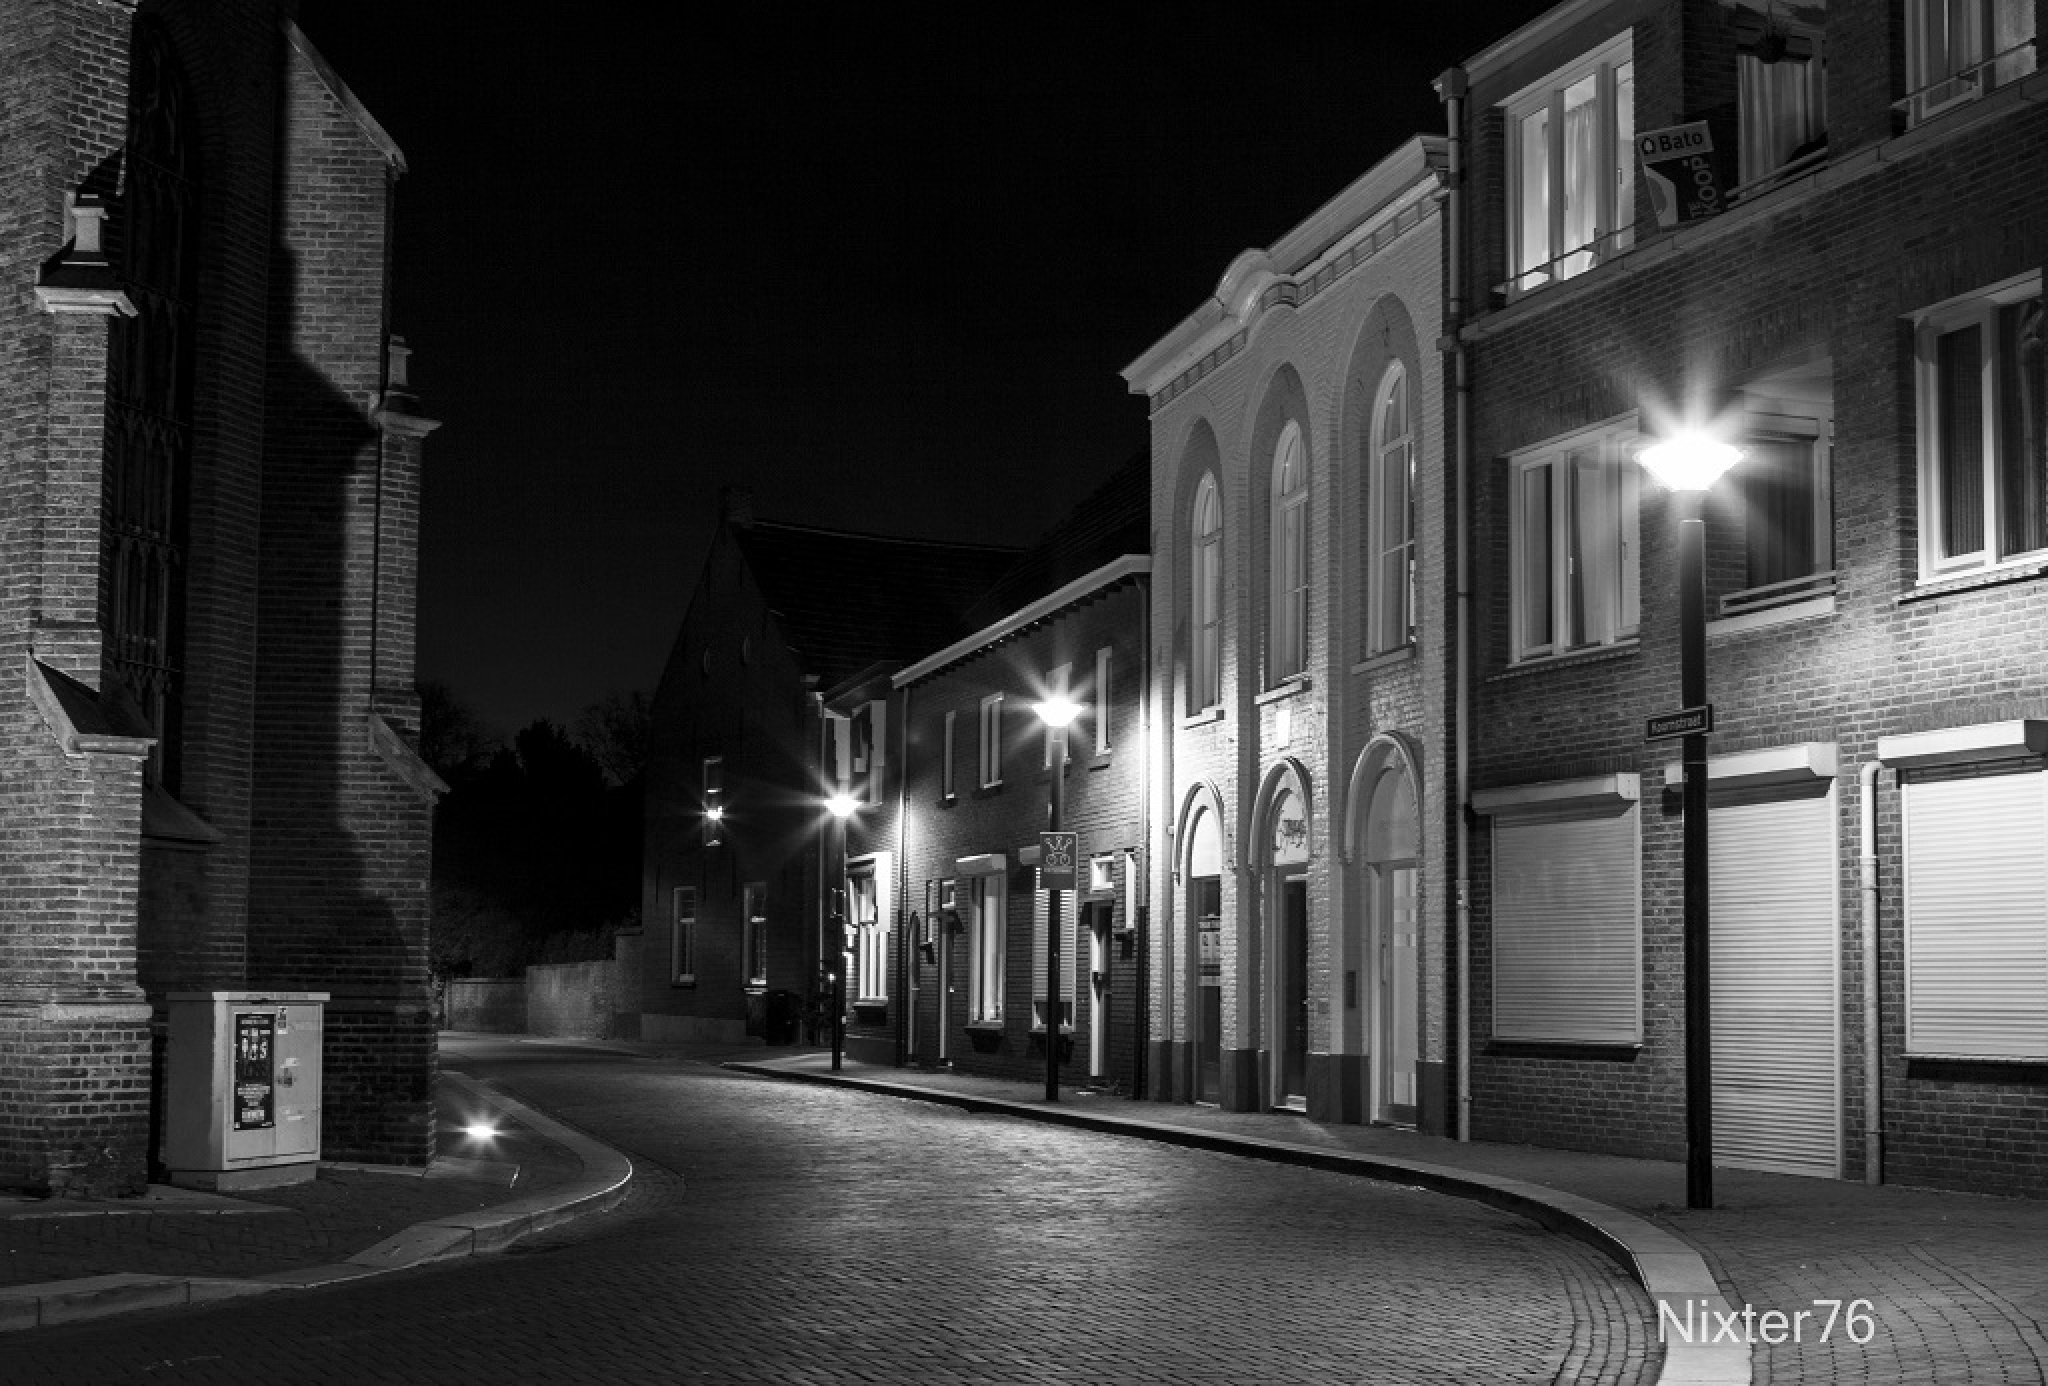 Straat in Oss by NikivandeLaar